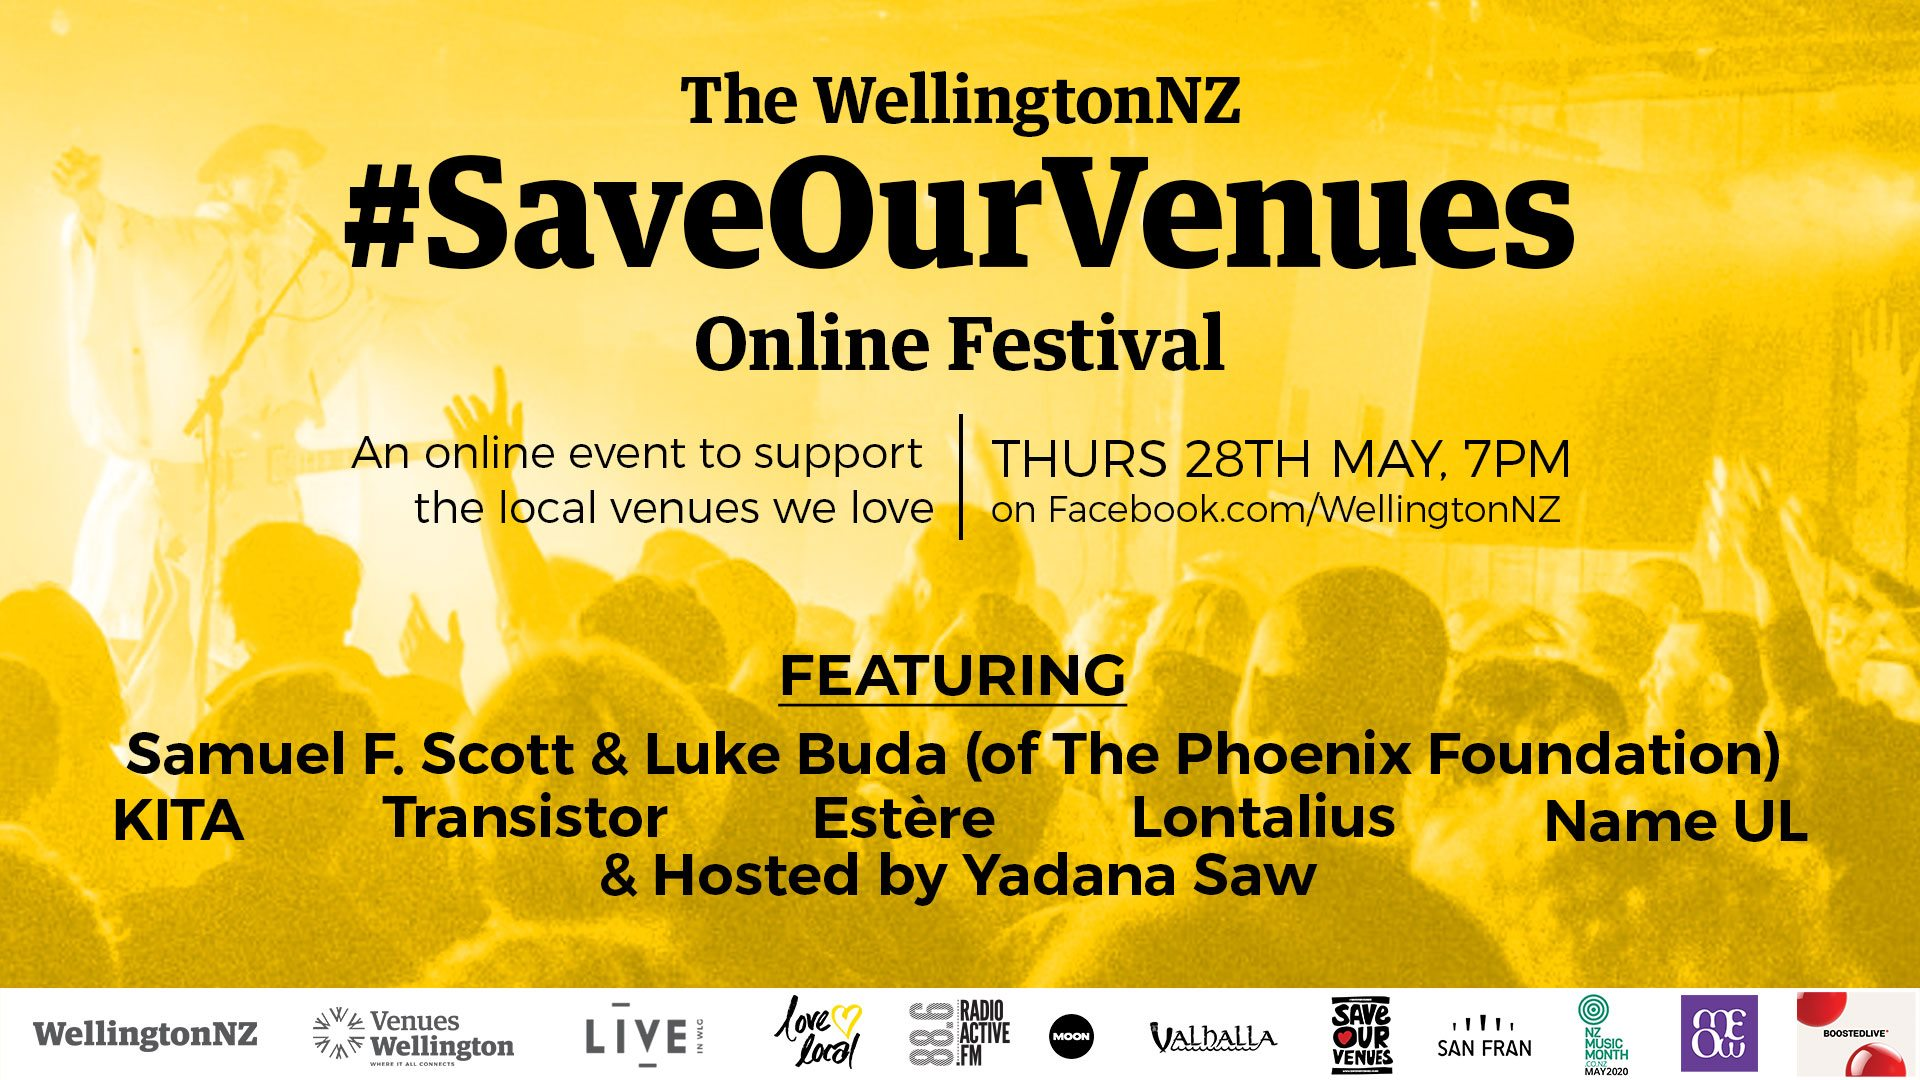 The WellingtonNZ #SaveOurVenues Online Festival